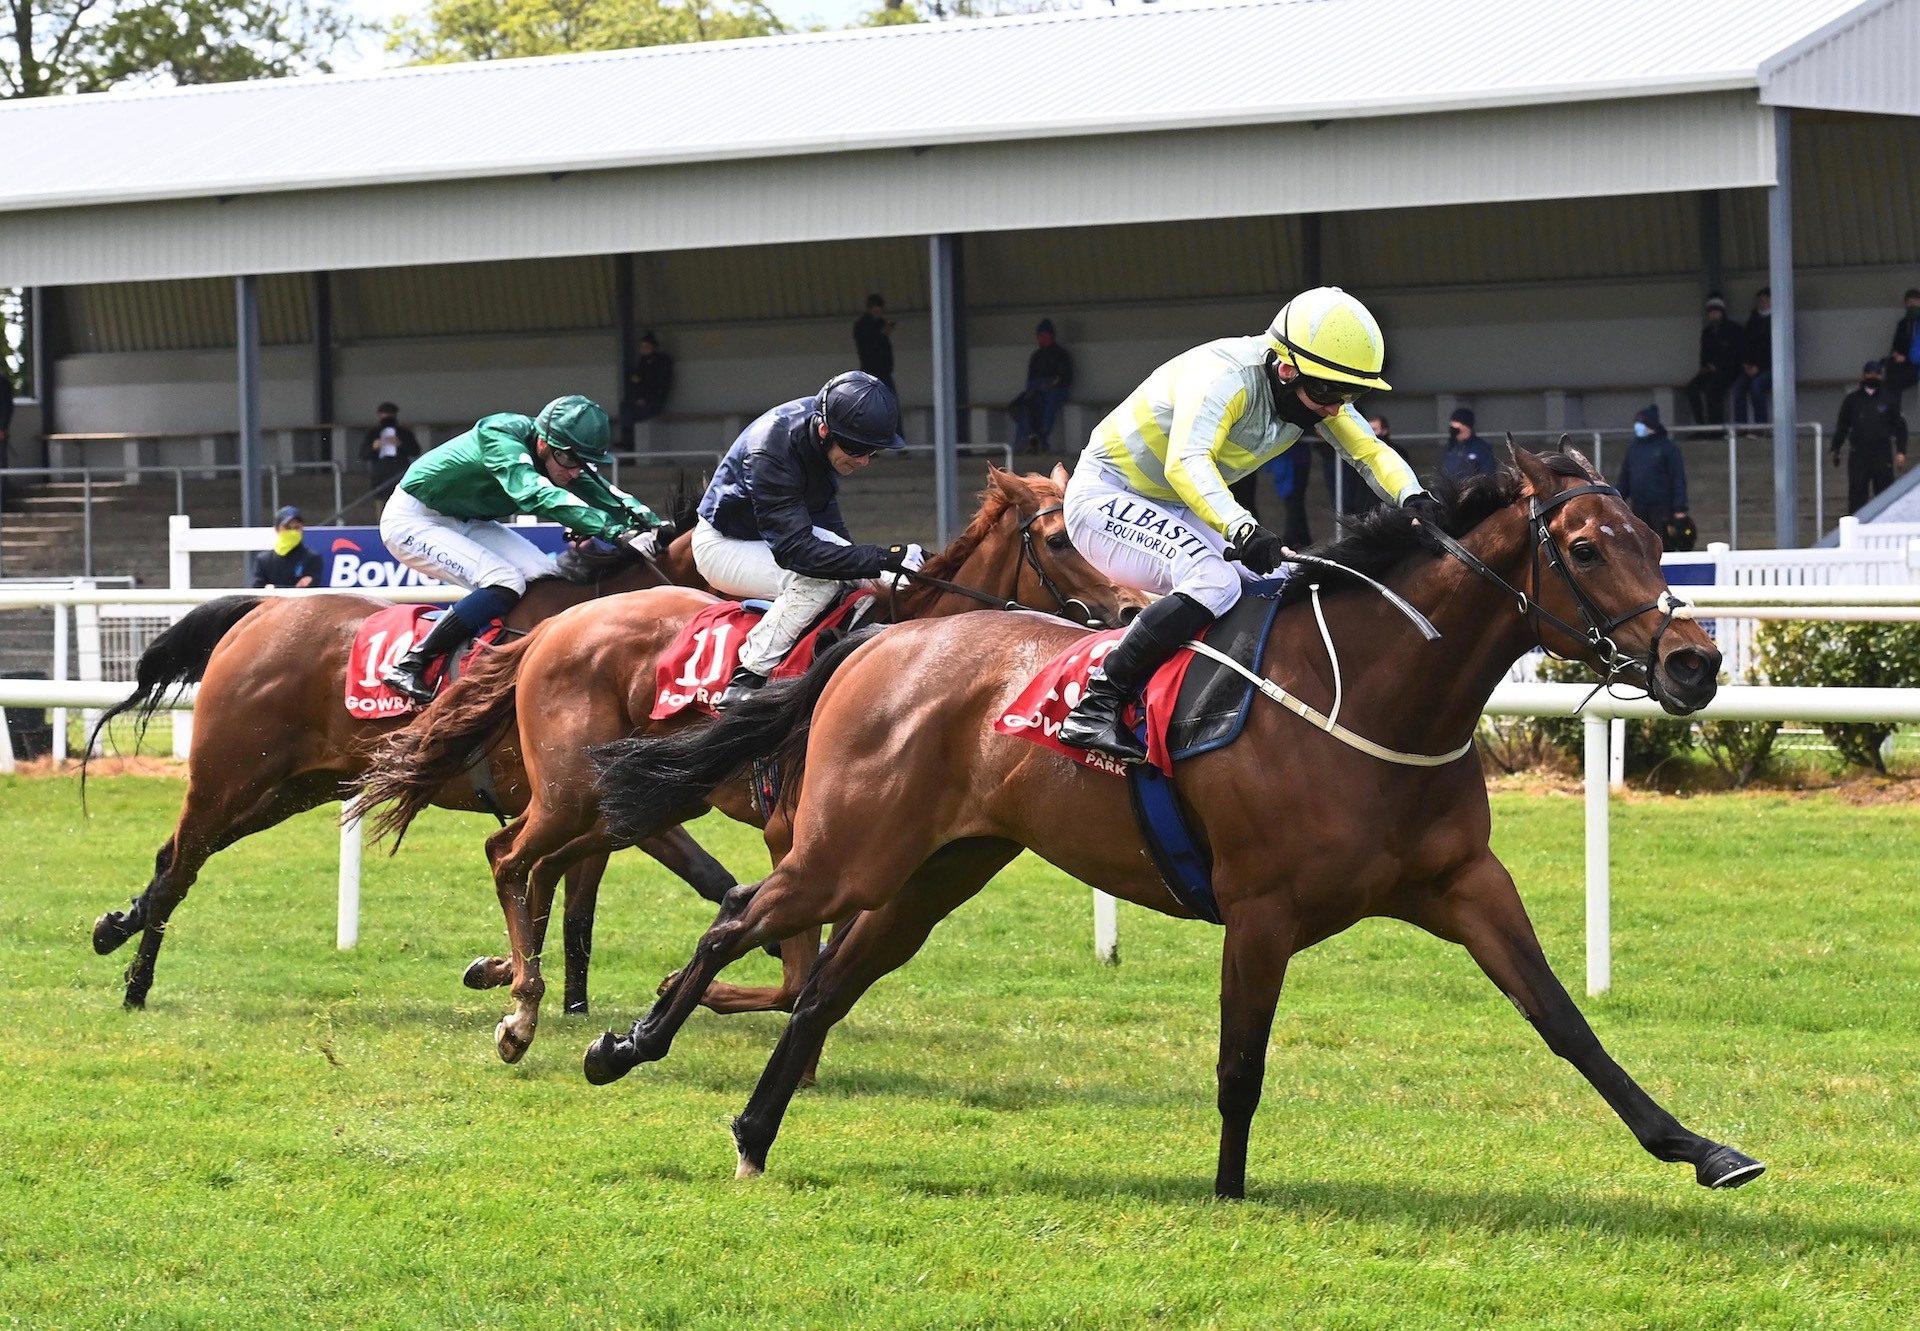 Torcedor (Fastnet Rock) winning the Sagaro Stakes (Gr.3) at Ascot